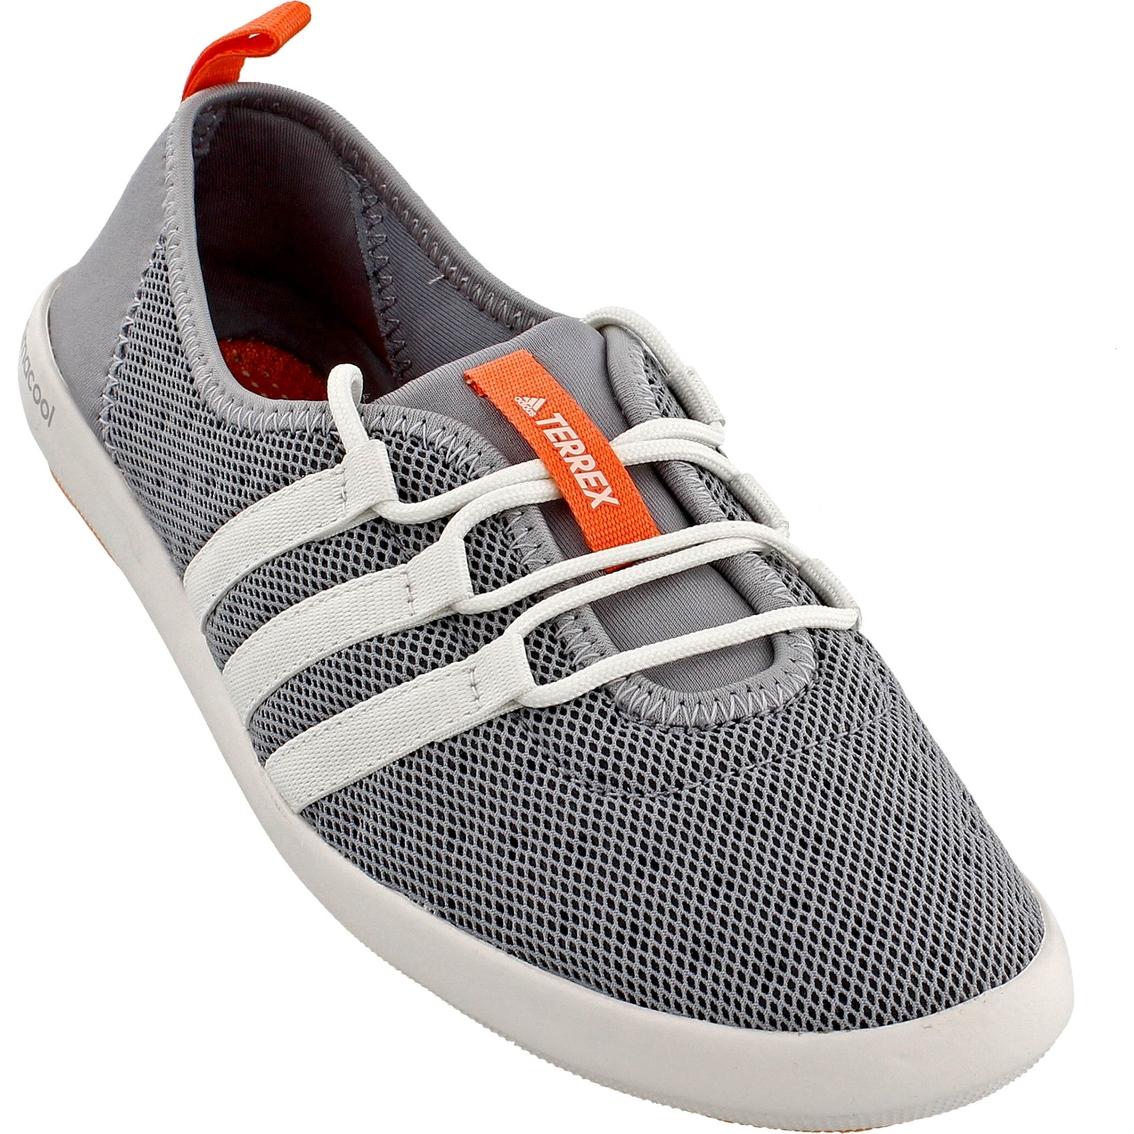 8f5b99bcfbfc Adidas Outdoor Women s Terrex Climacool Boat Sleek Shoes